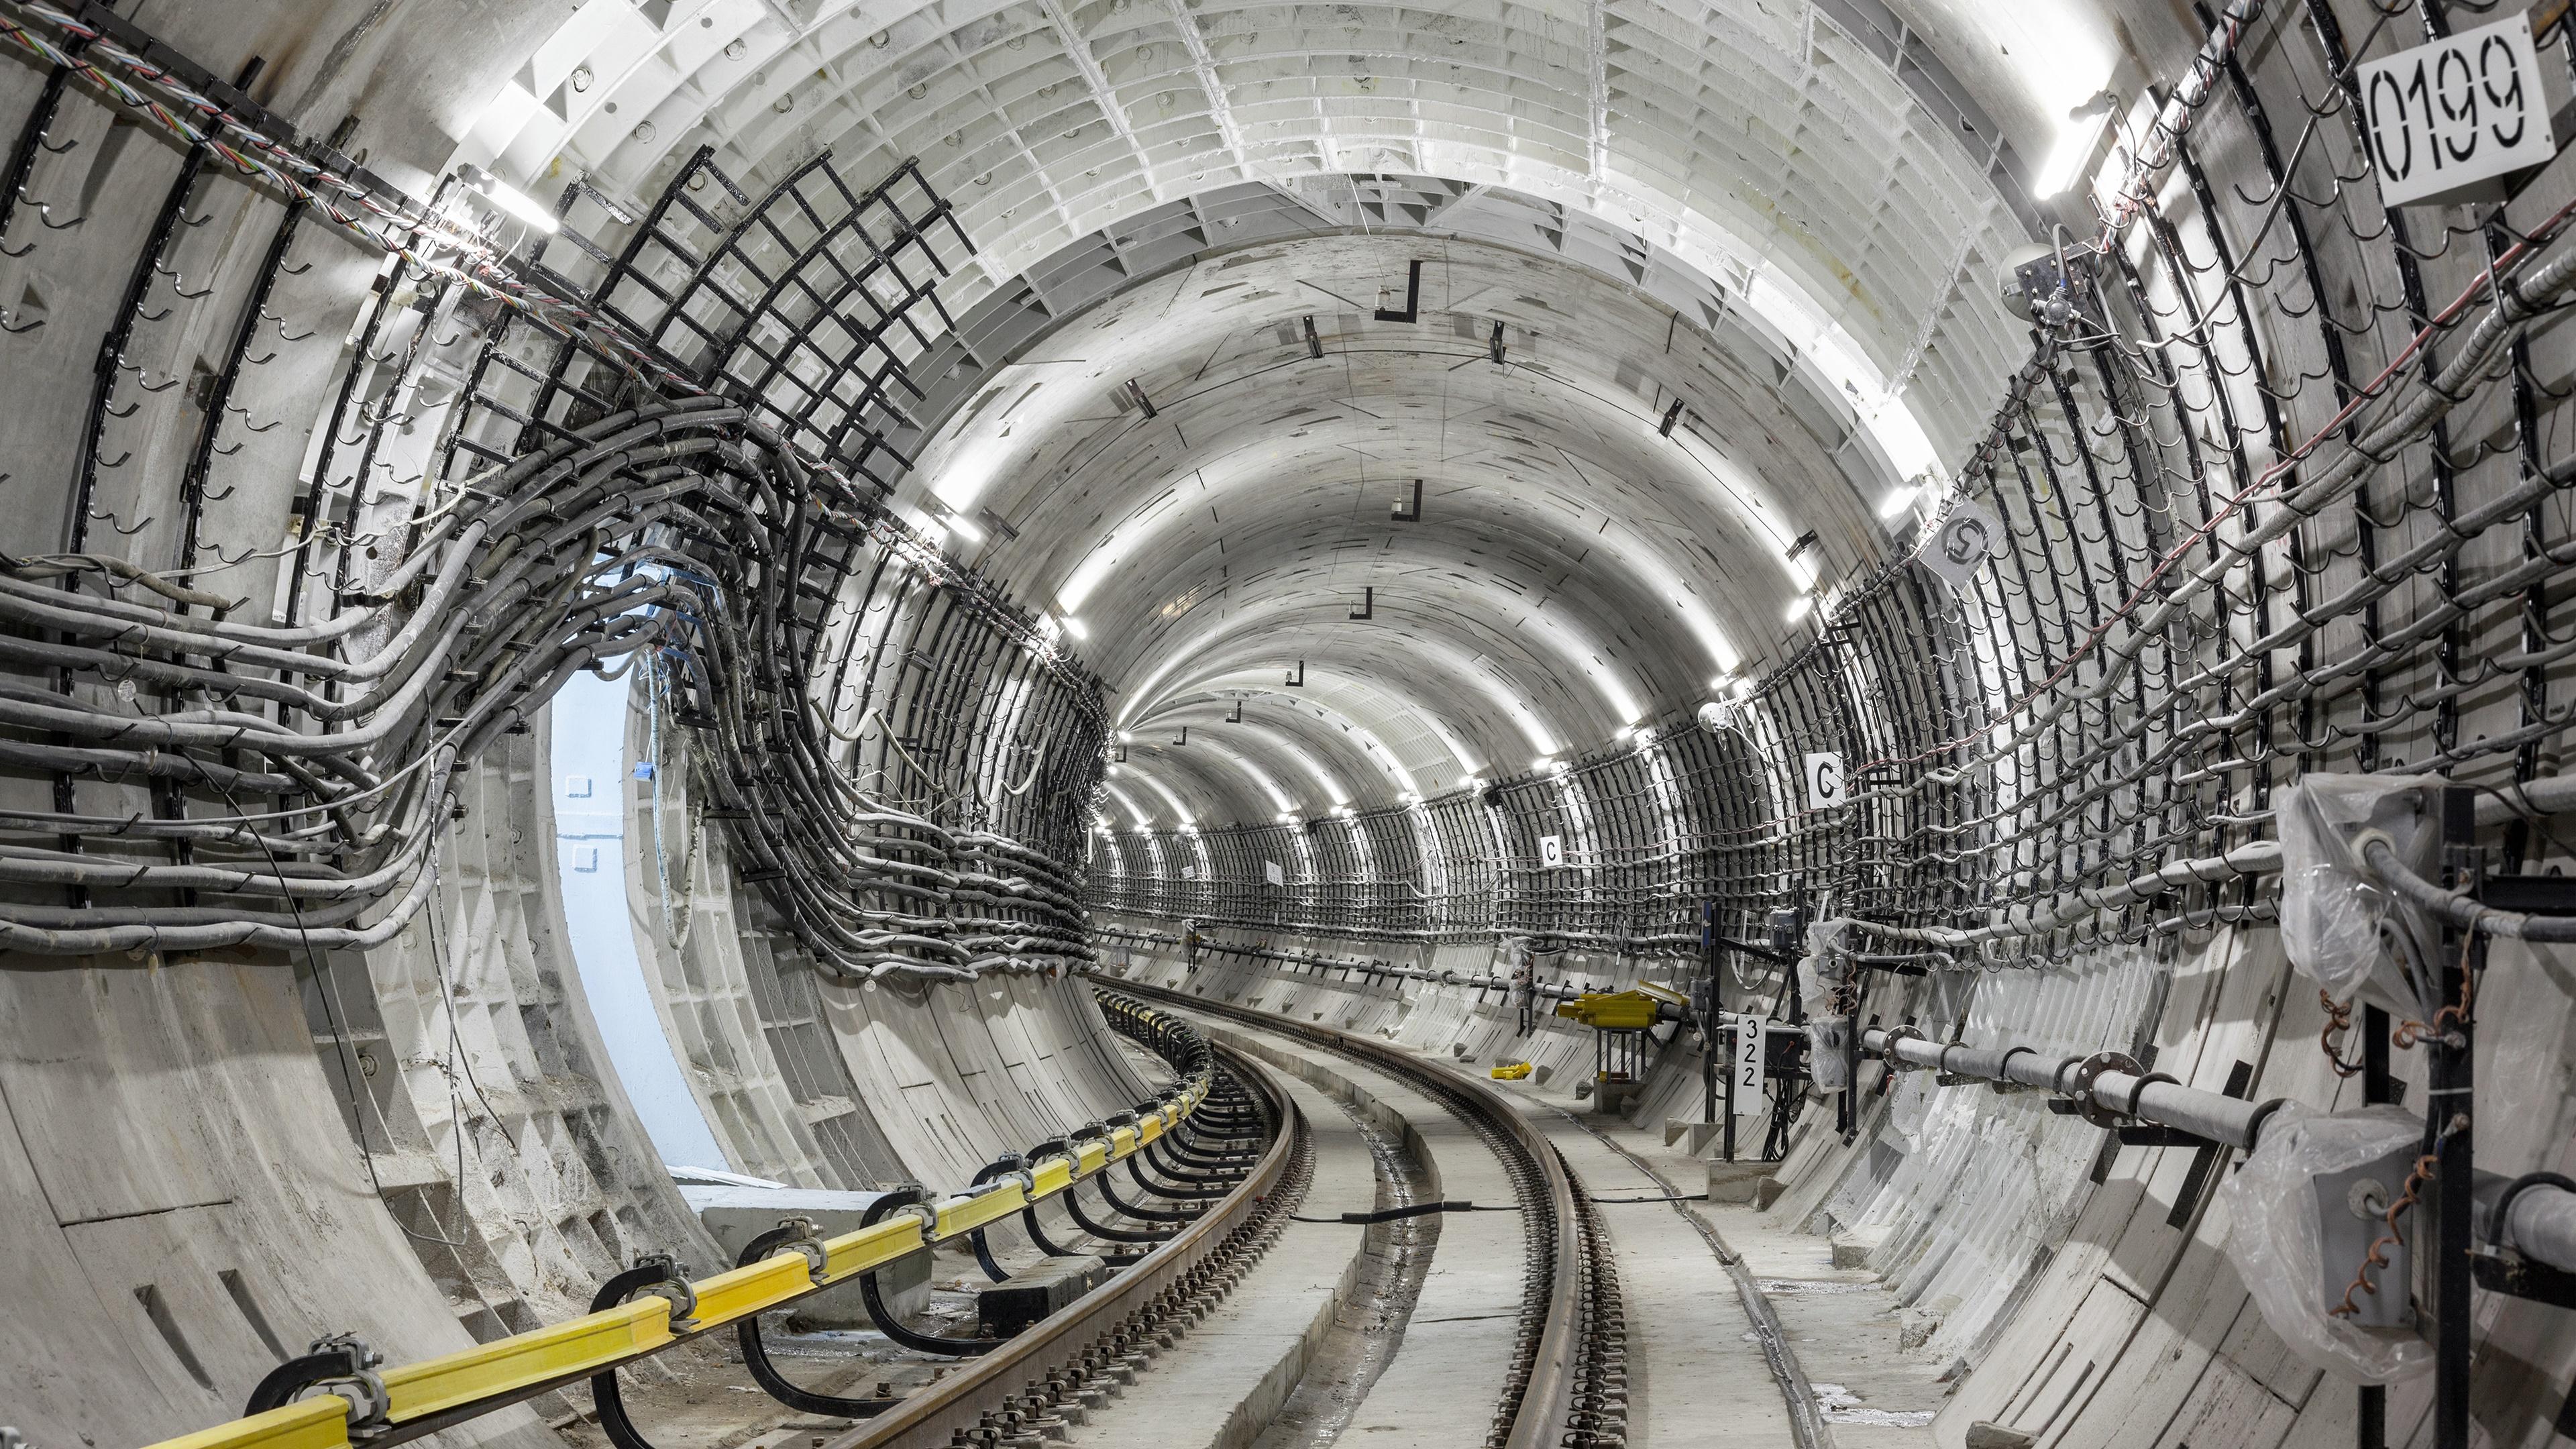 Metro Tunnel wallpaper